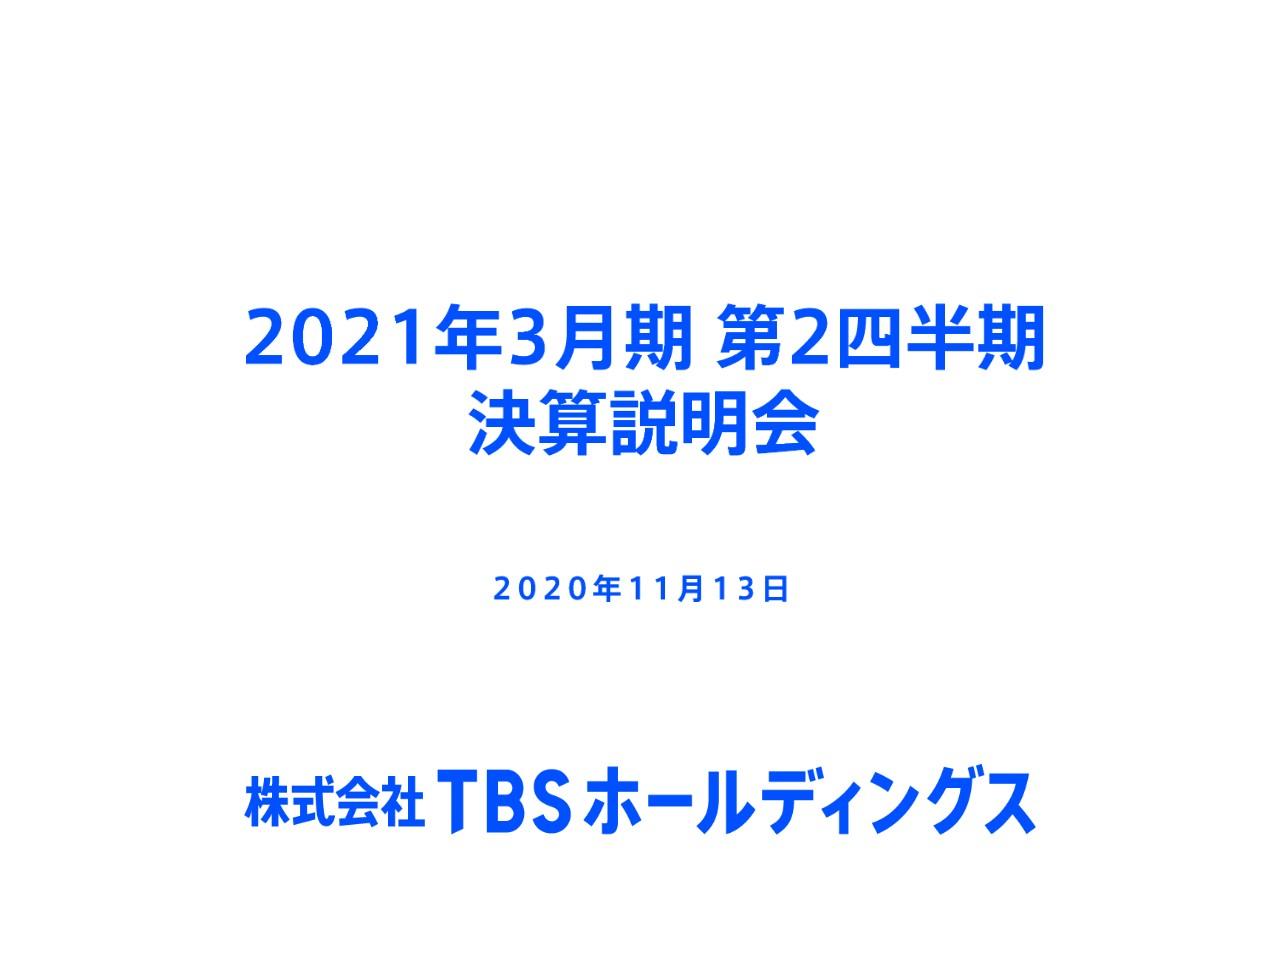 TBS HD、ドラマ『半沢直樹』等の視聴率が堅調もコロナ影響が大きく、連結ベースで減収減益